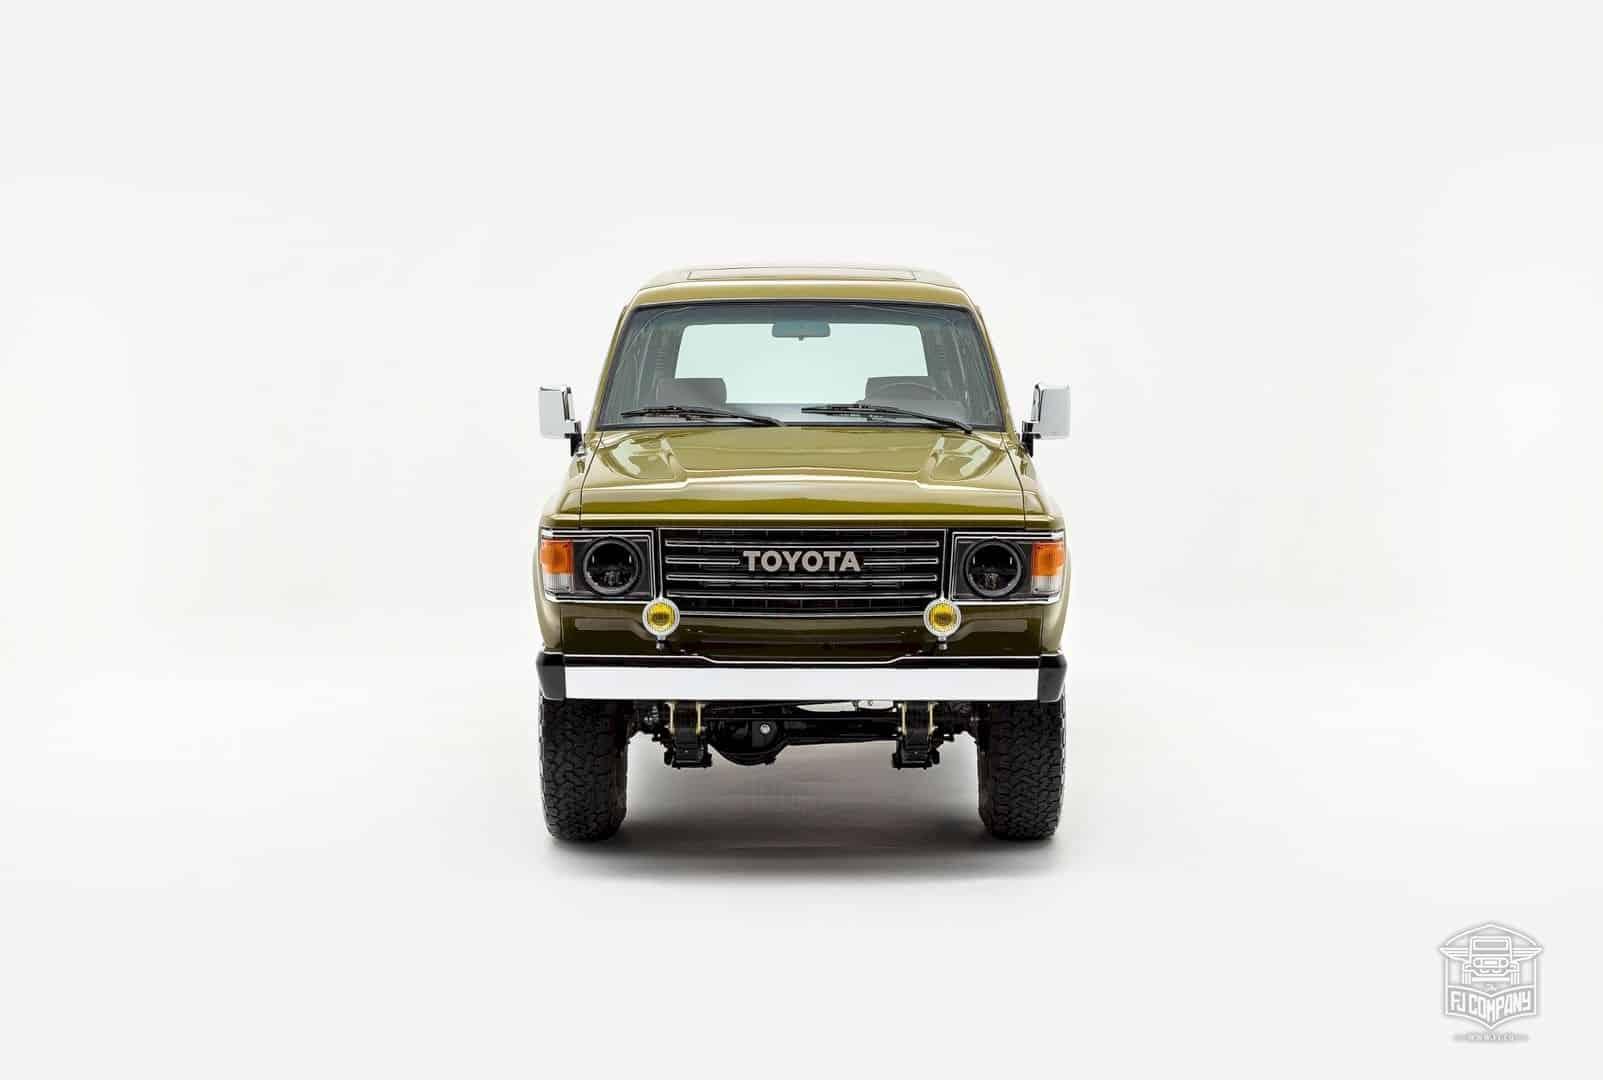 1986 Toyota Land Cruiser Fj62 Olive 6